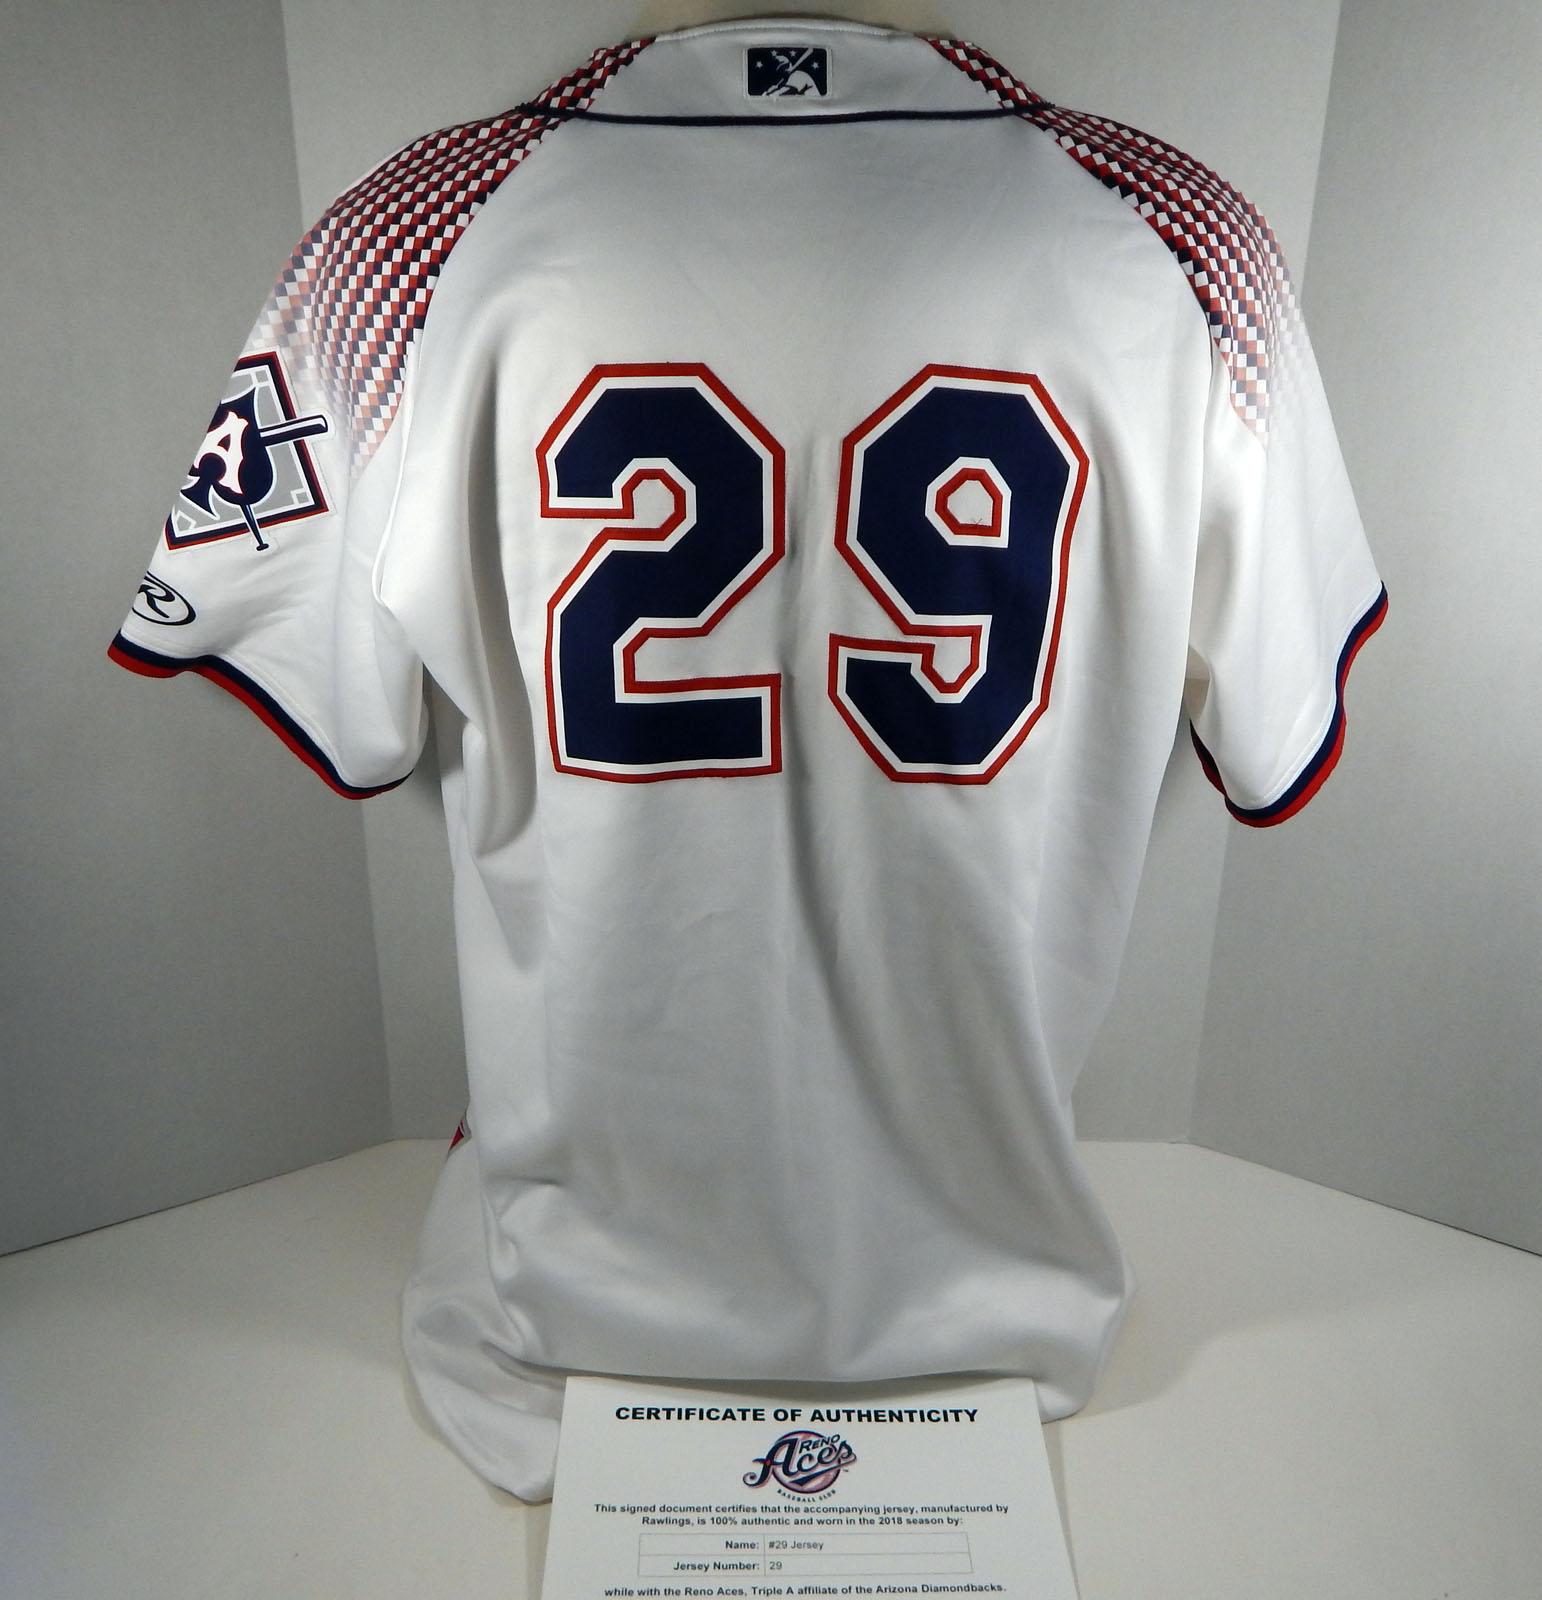 2018 Reno Aces #29 Game Used White Jersey DP01408 | eBay